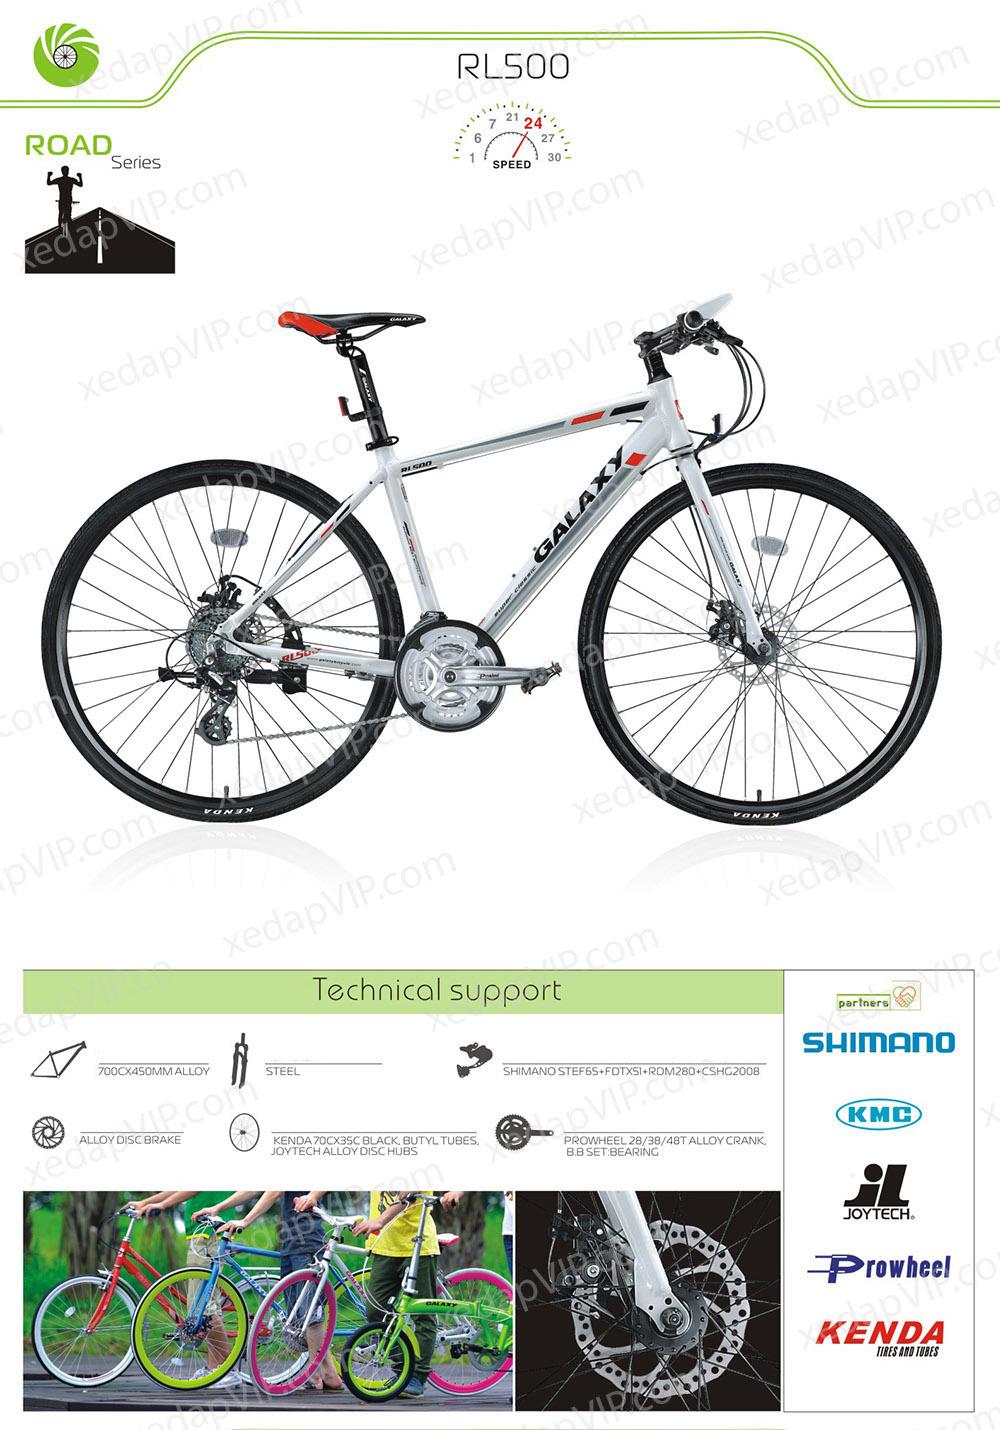 xe dap GALAXY RL500, xe dap the thao, xe dap trinx, xe đạp thể thao chính hãng, xe dap asama, rl500